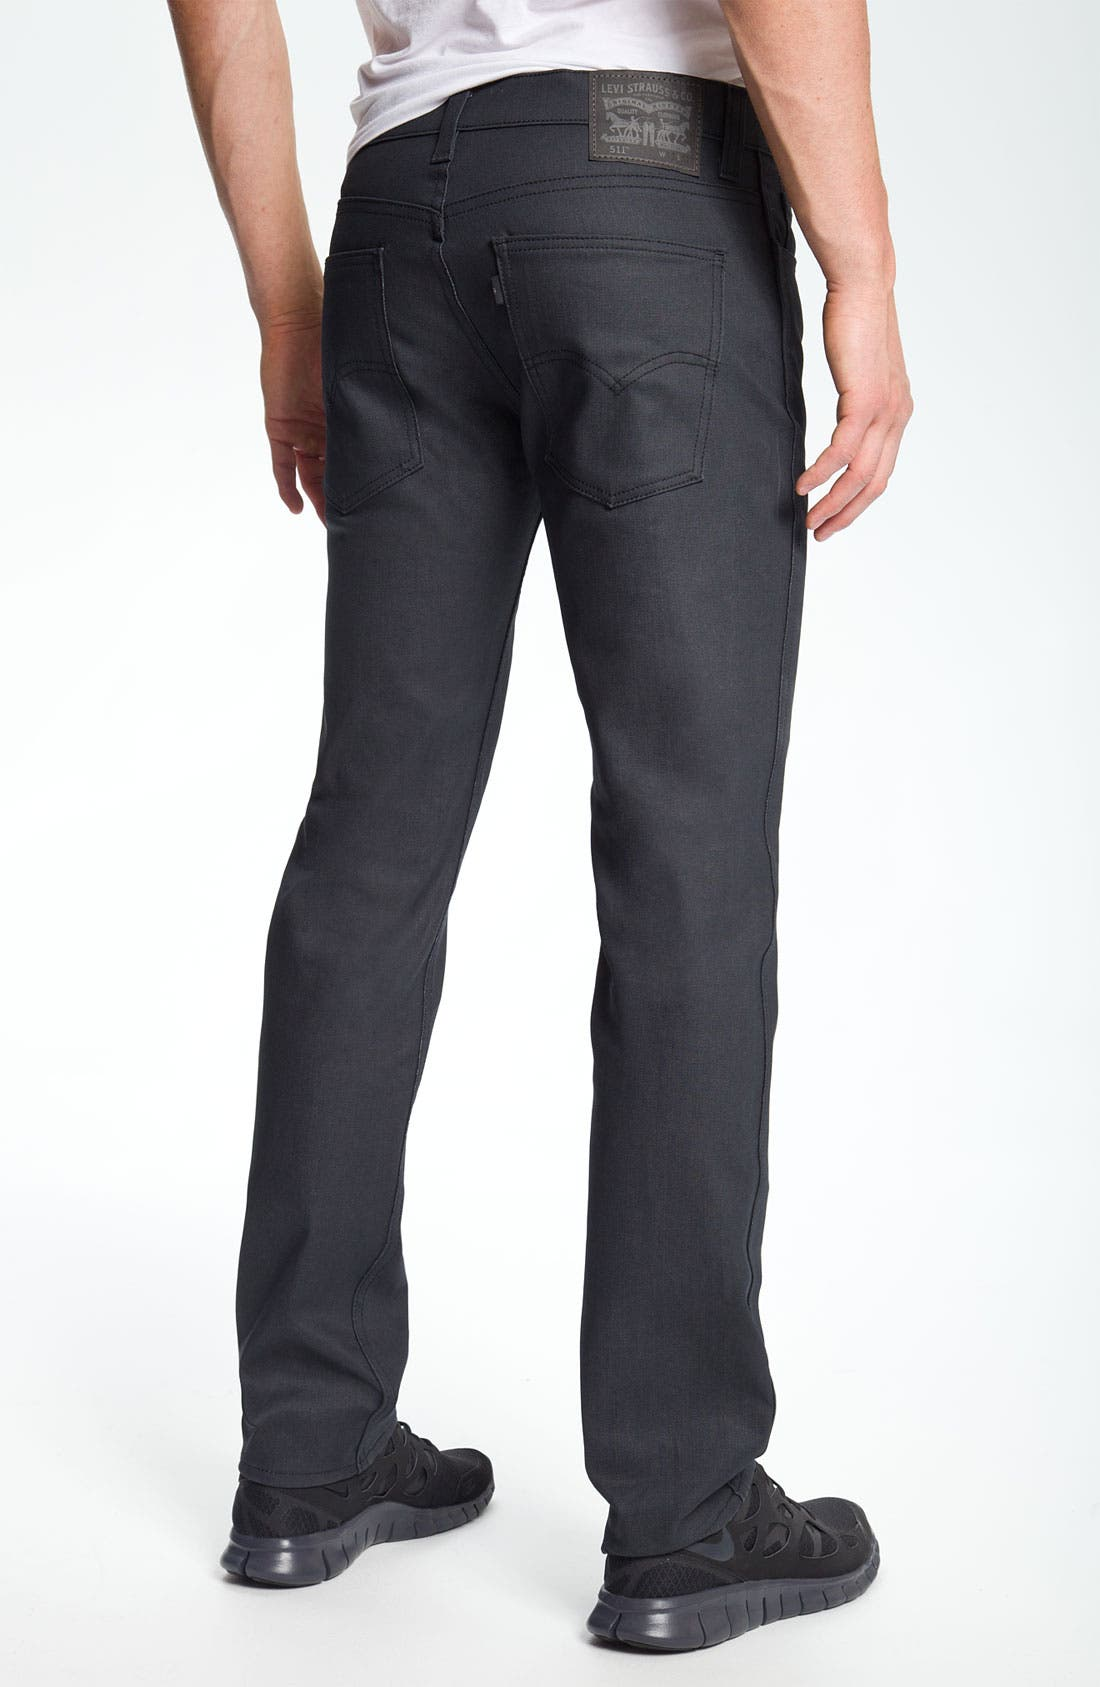 Main Image - Levi's® '511' Slim Fit Jeans (Anthracite)